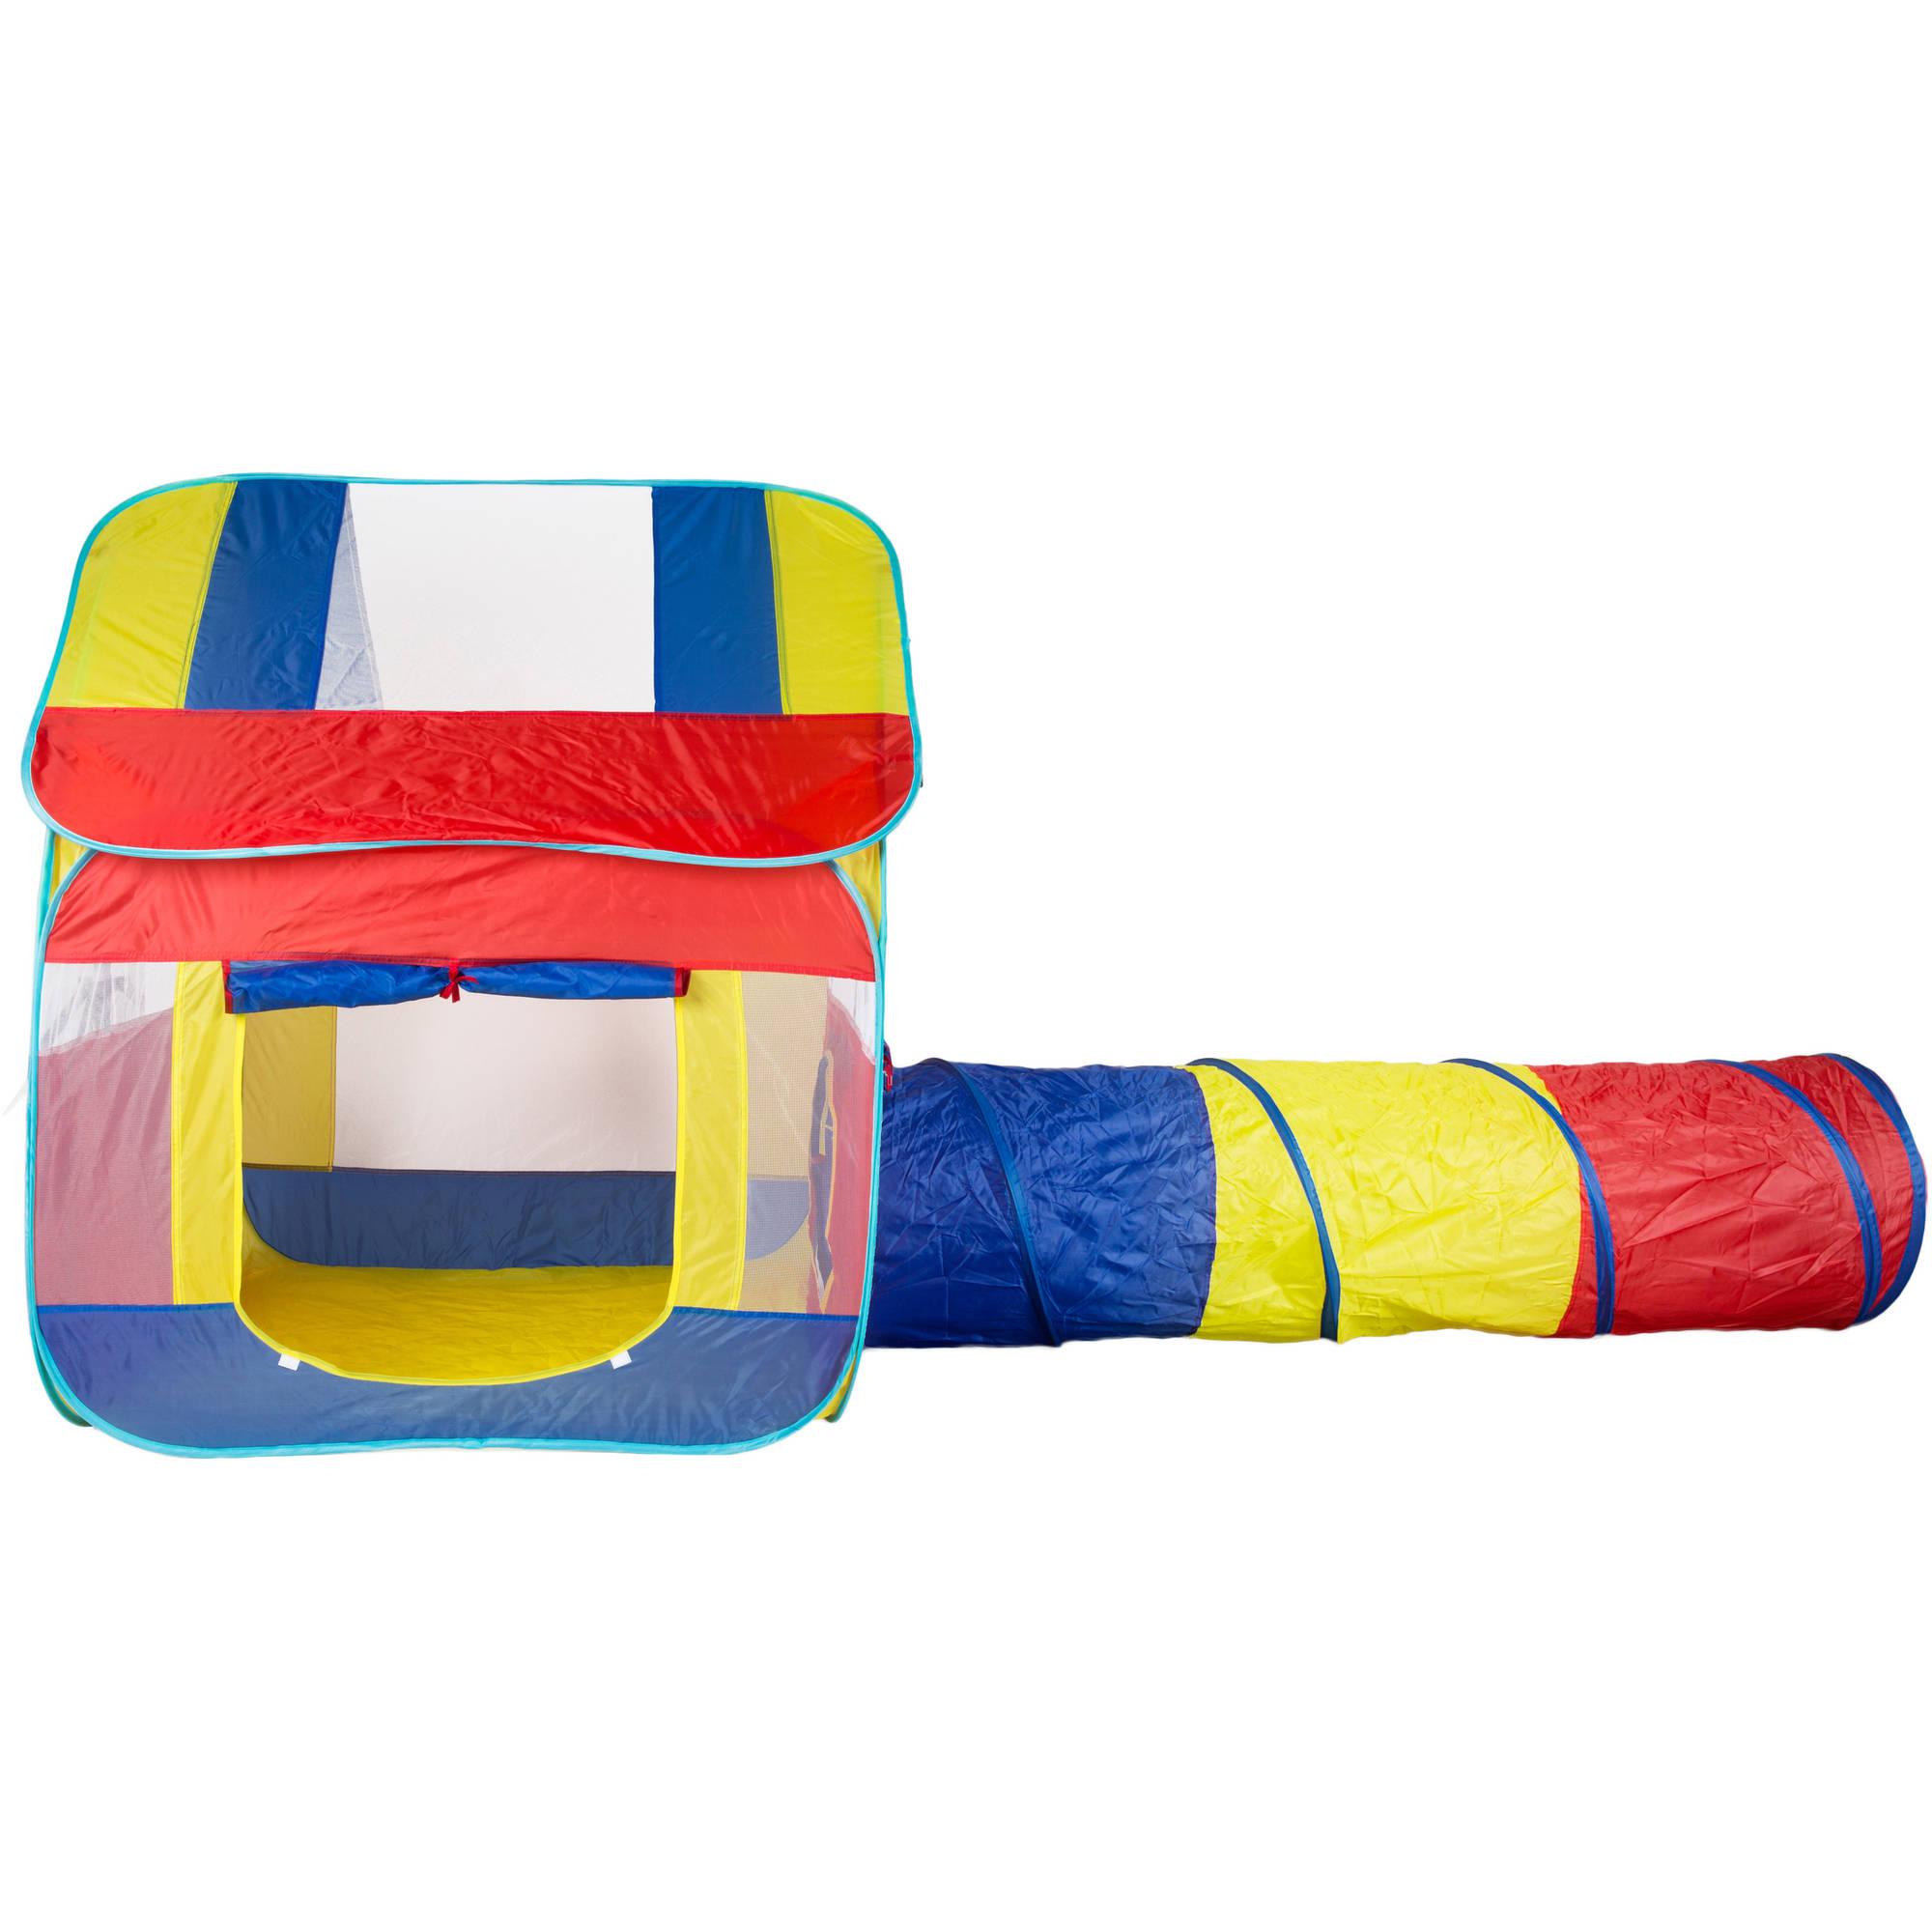 Kayata Kids House and Tunnel Children's Fun Playhouse Tent